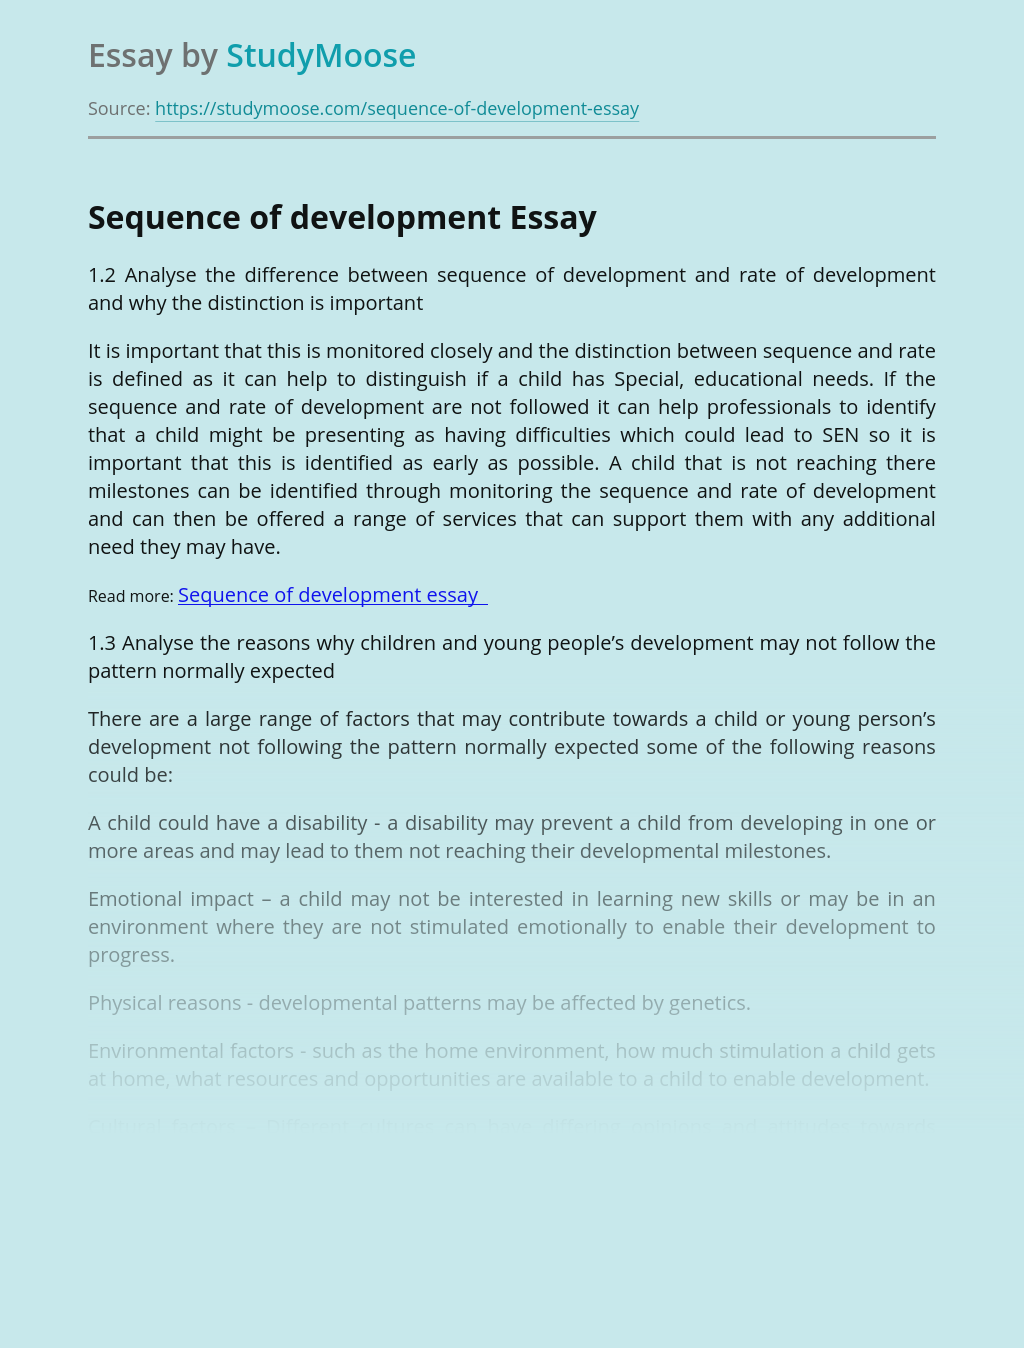 Sequence of development